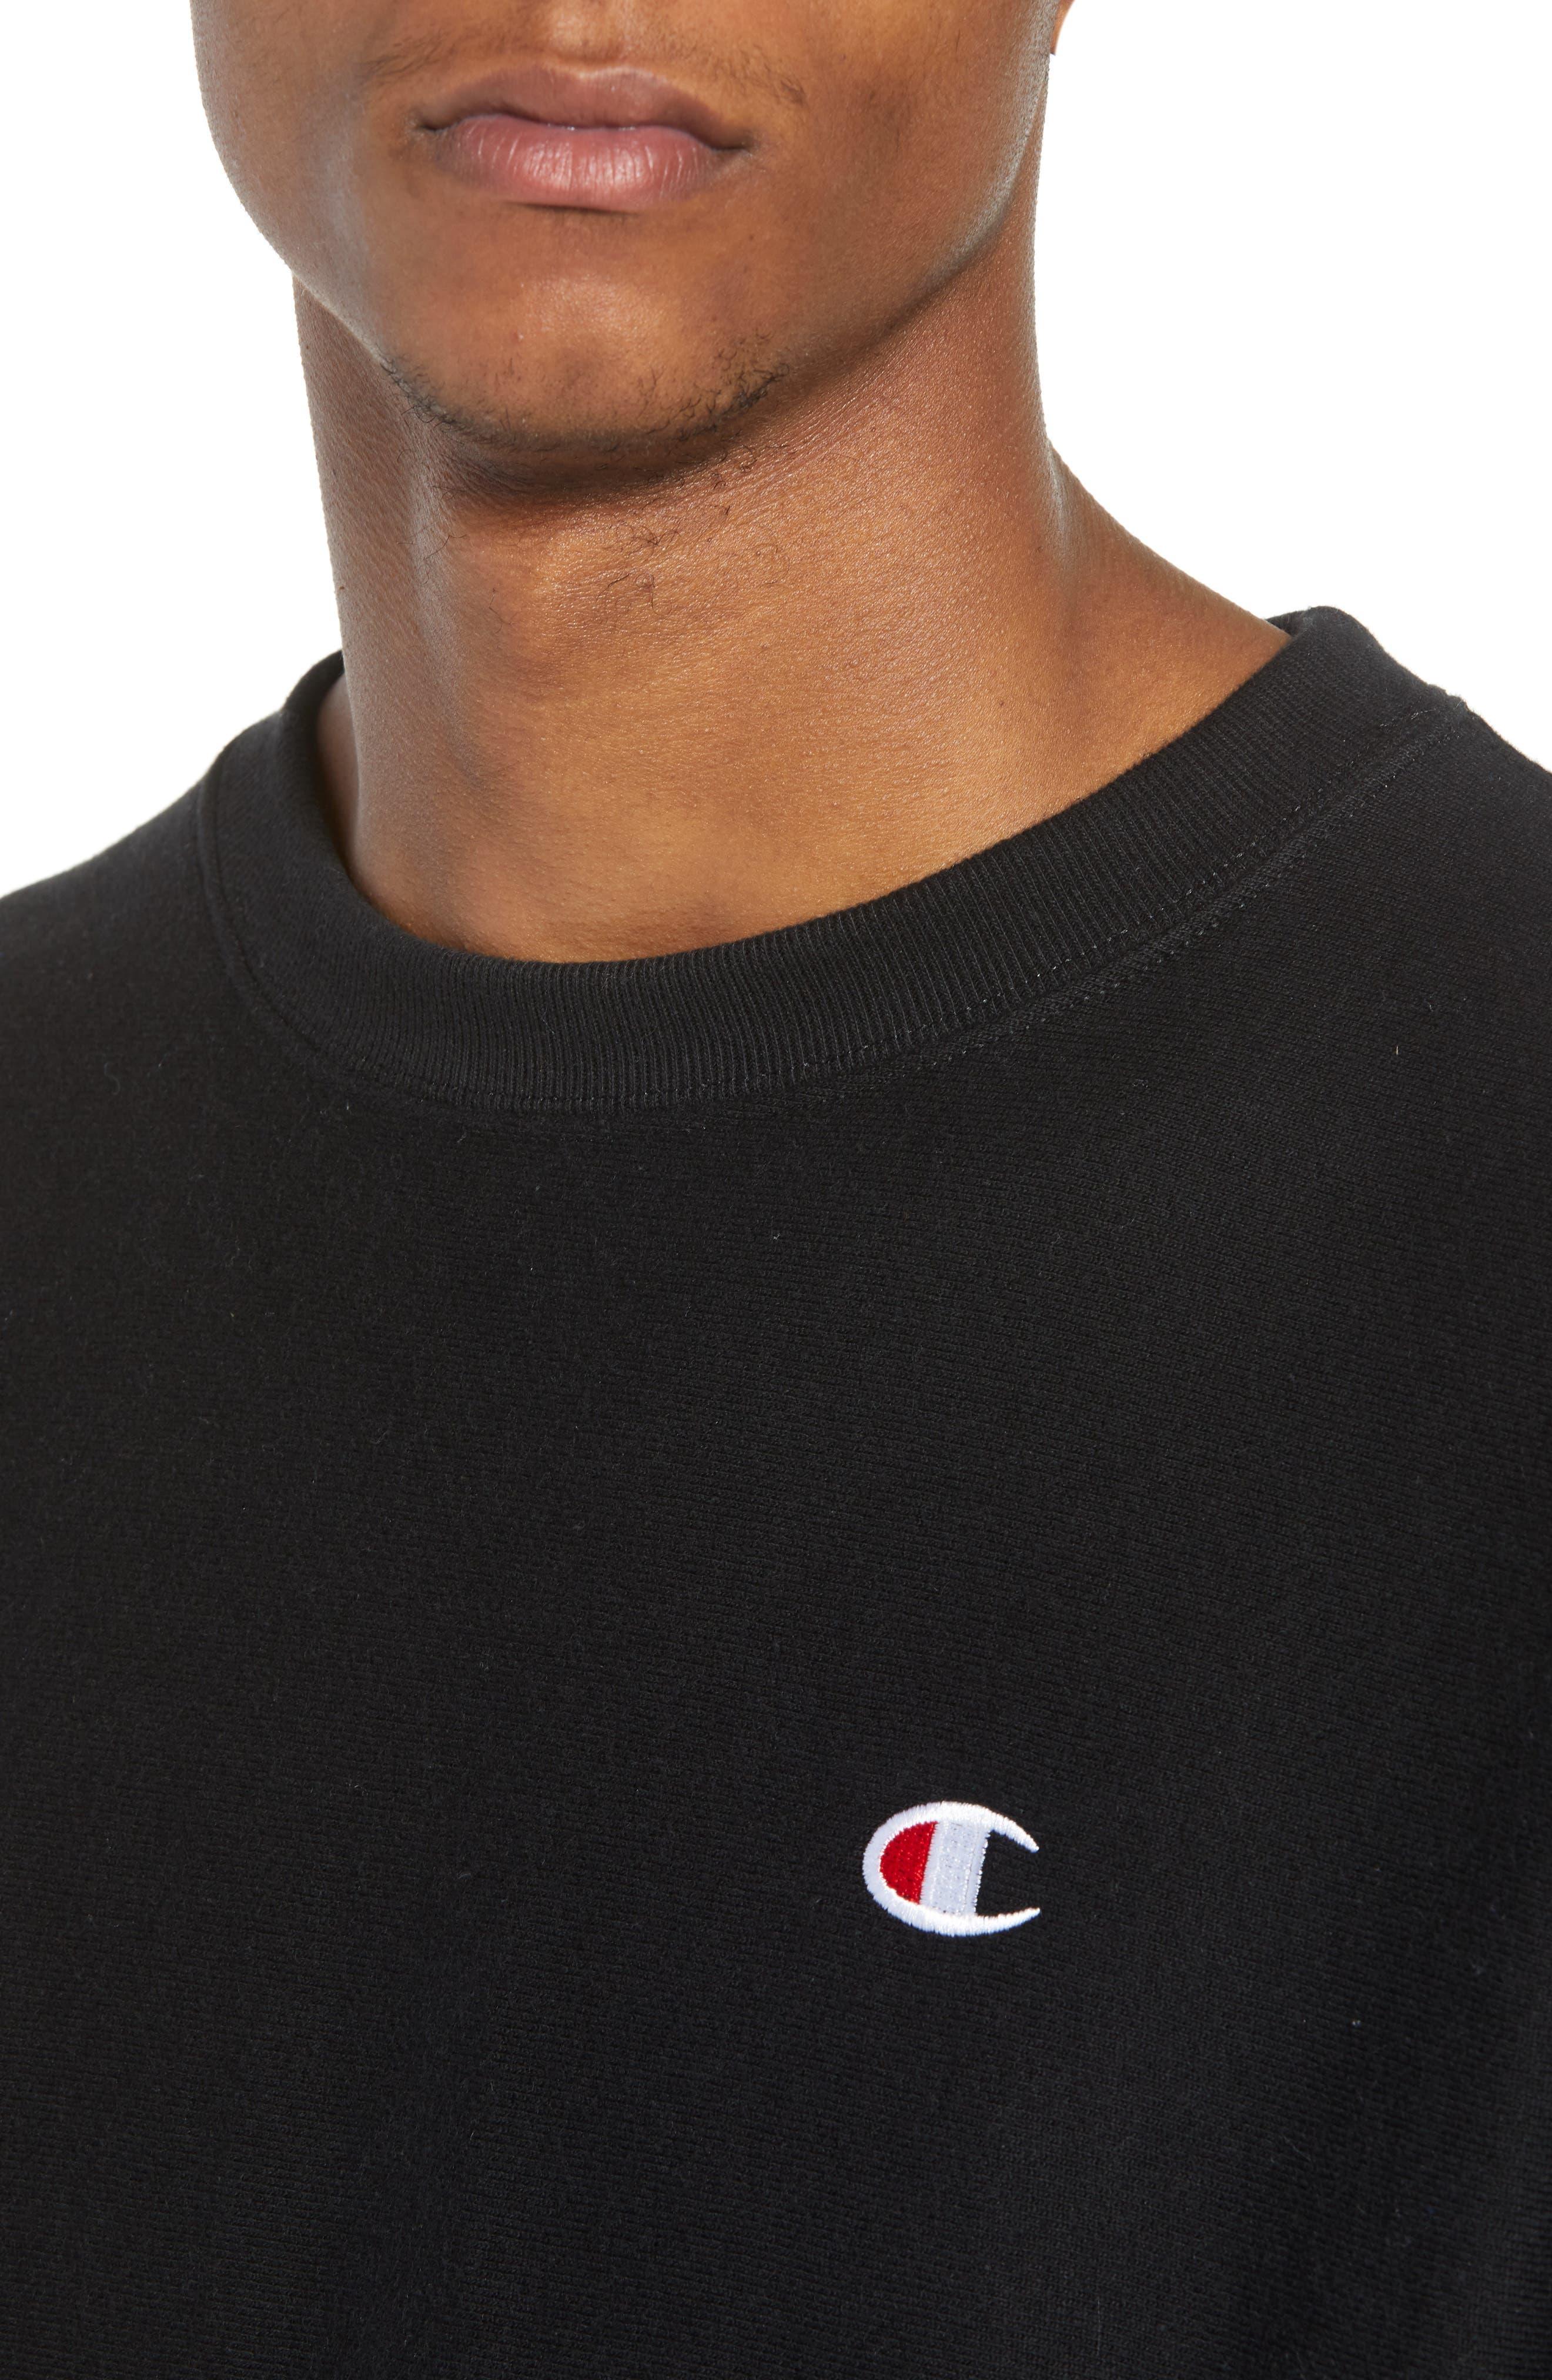 Reverse Weave Sweatshirt,                             Alternate thumbnail 20, color,